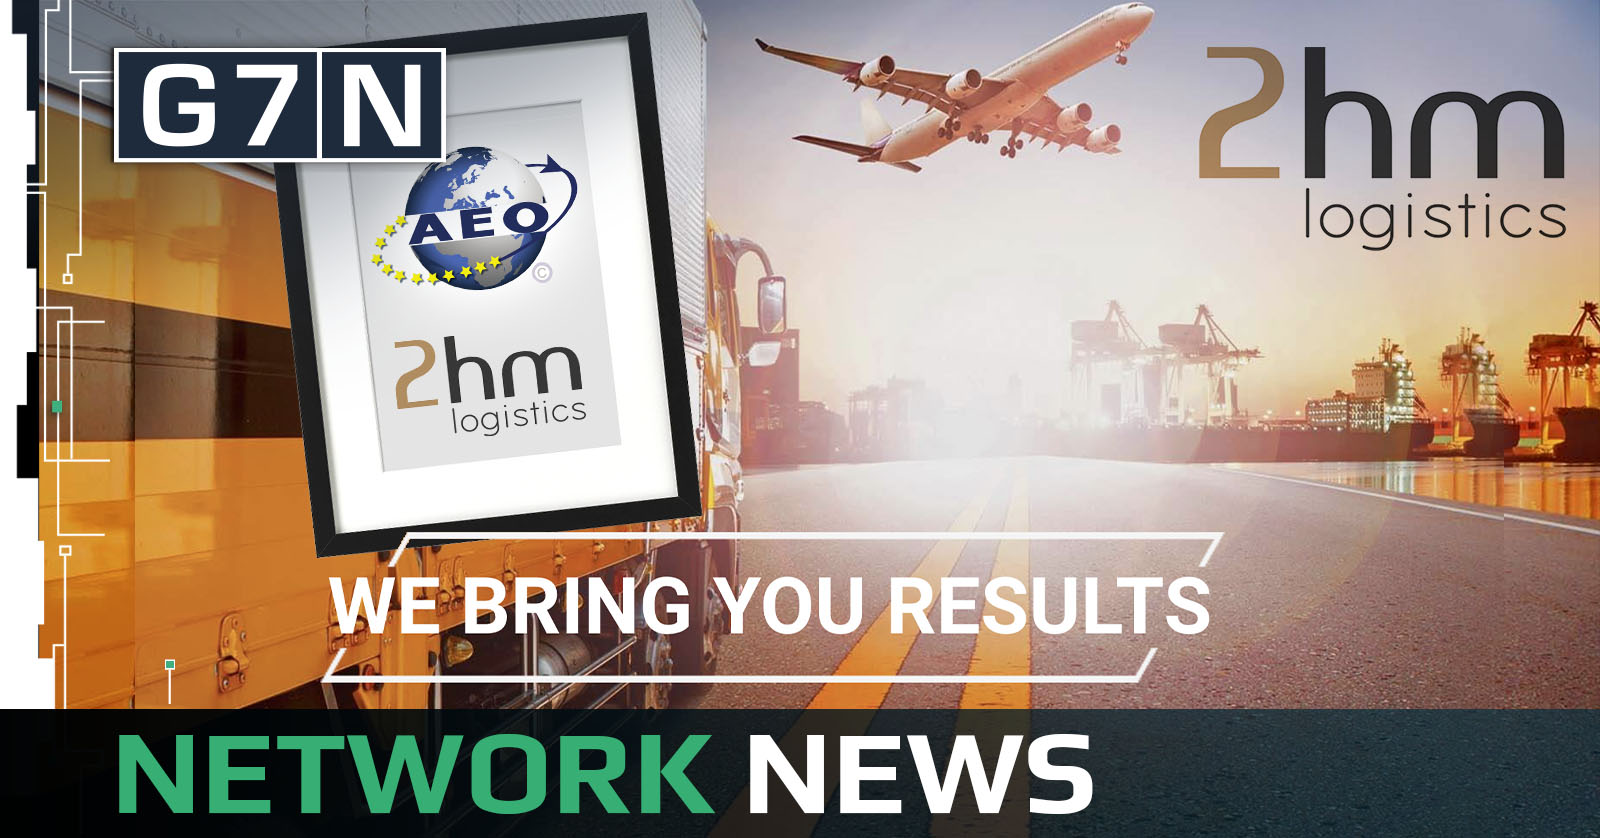 https://newg7dashboard.g7networks.com/news/news__070721_G7N_2hm_NEWS2.jpg